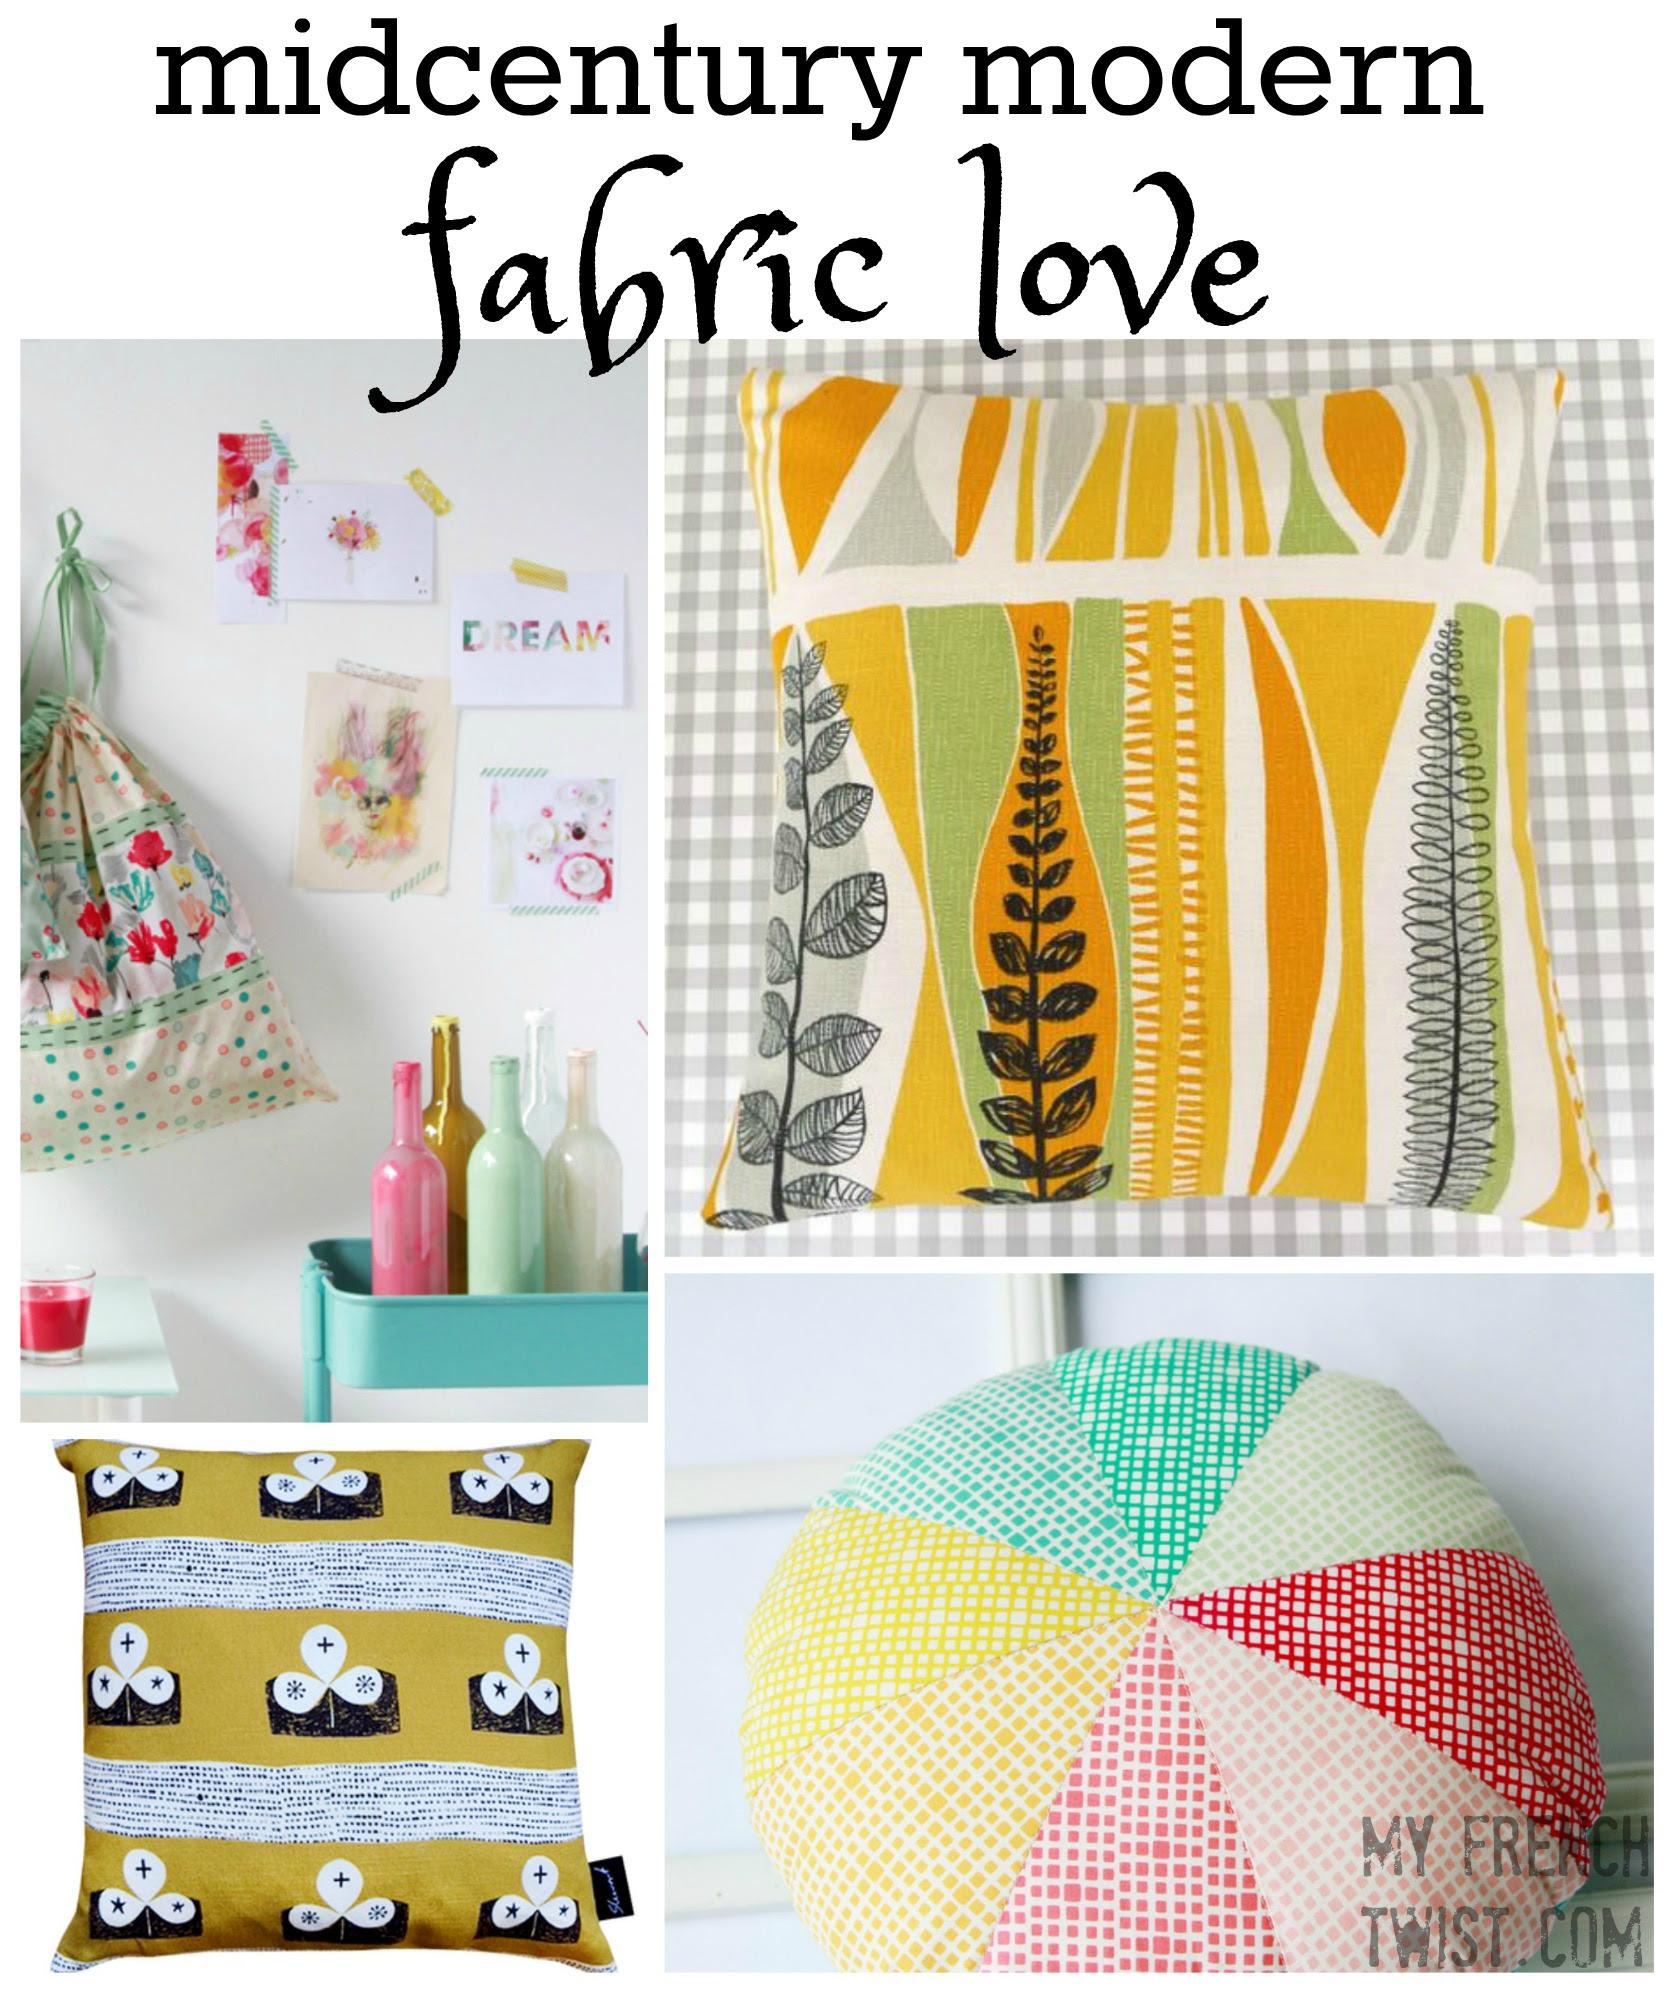 Midcentury Modern Fabric Love My French Twist